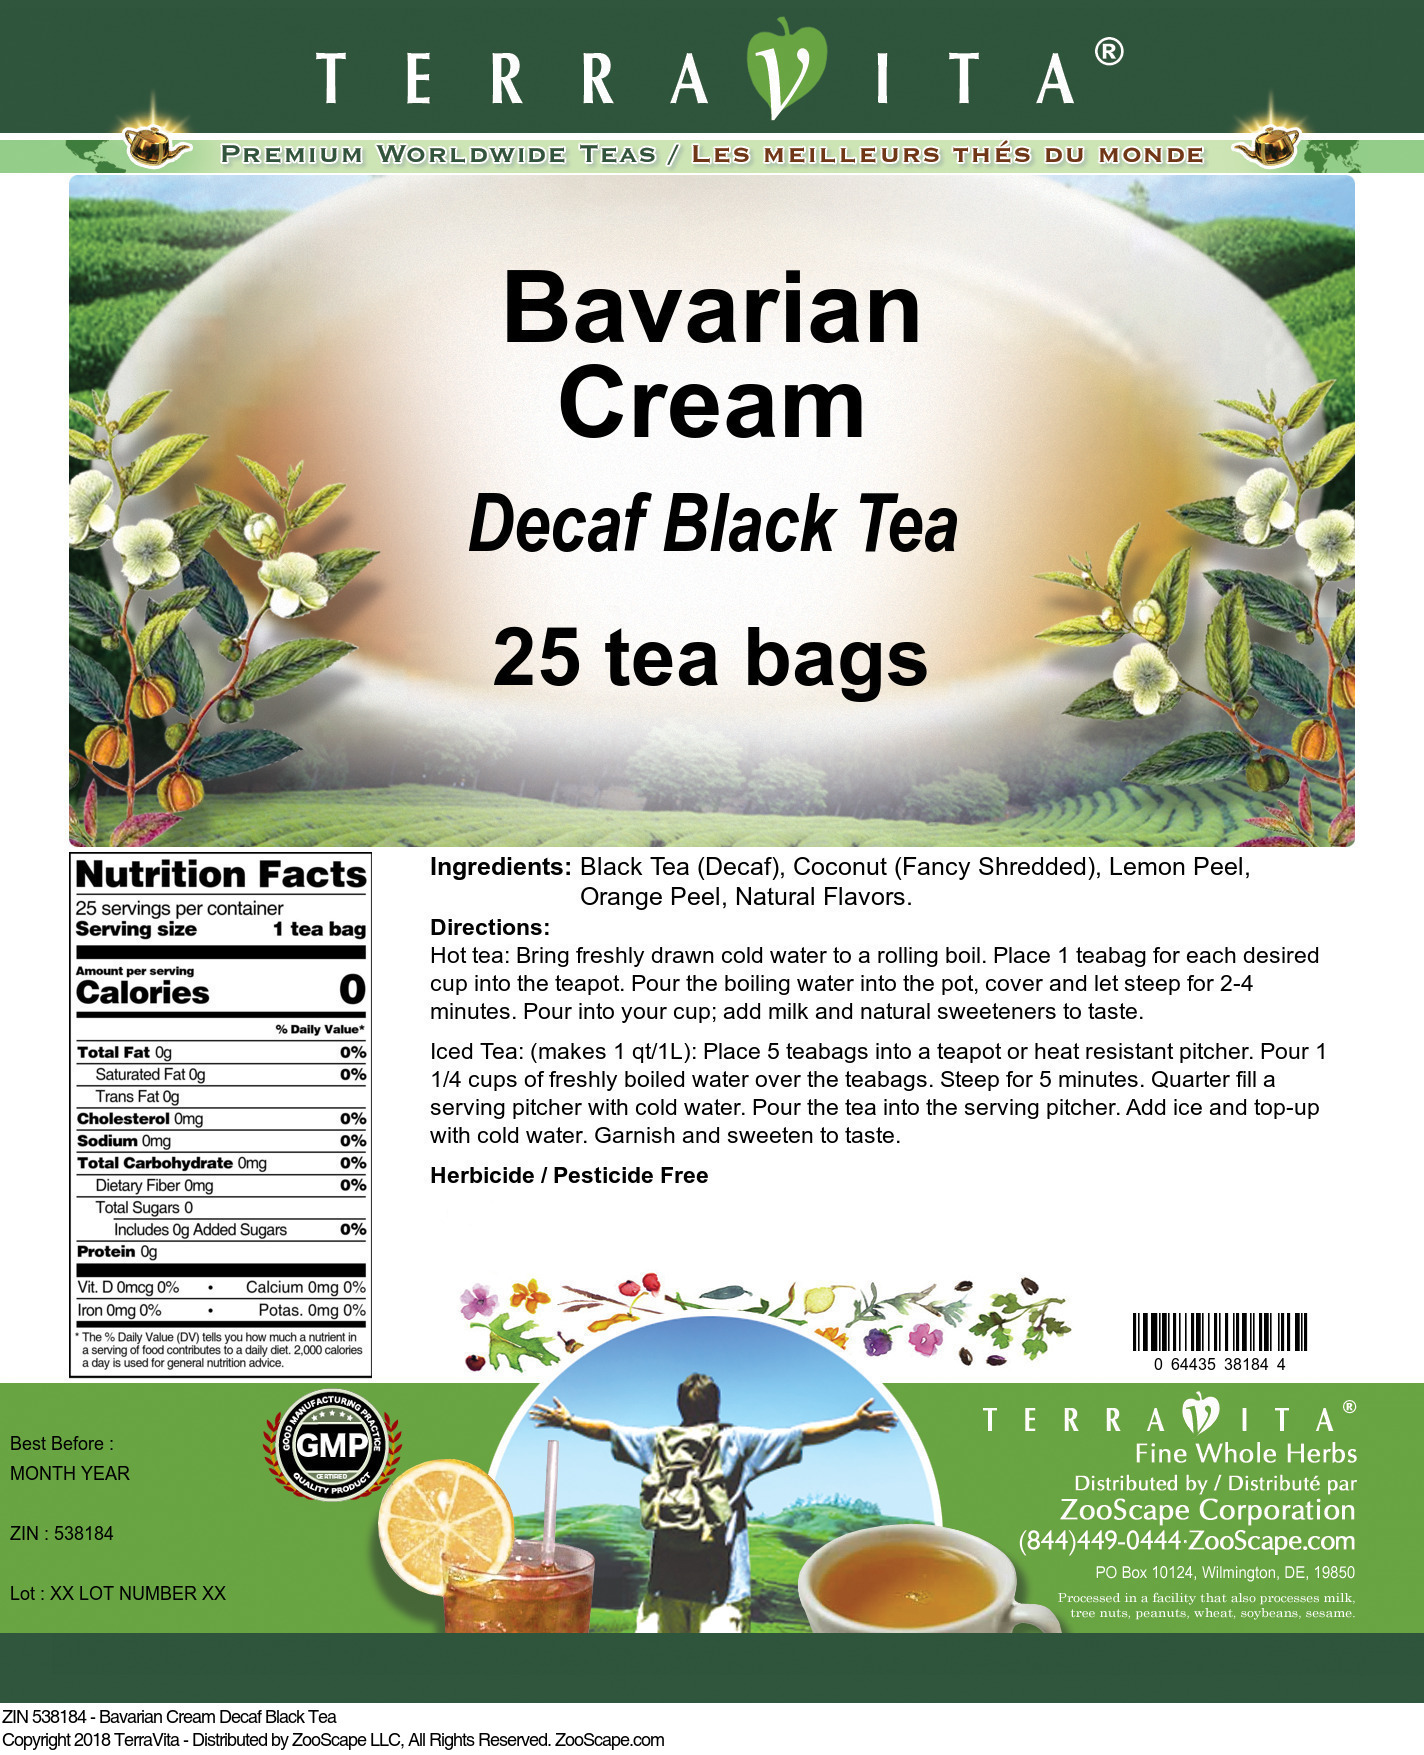 Bavarian Cream Decaf Black Tea